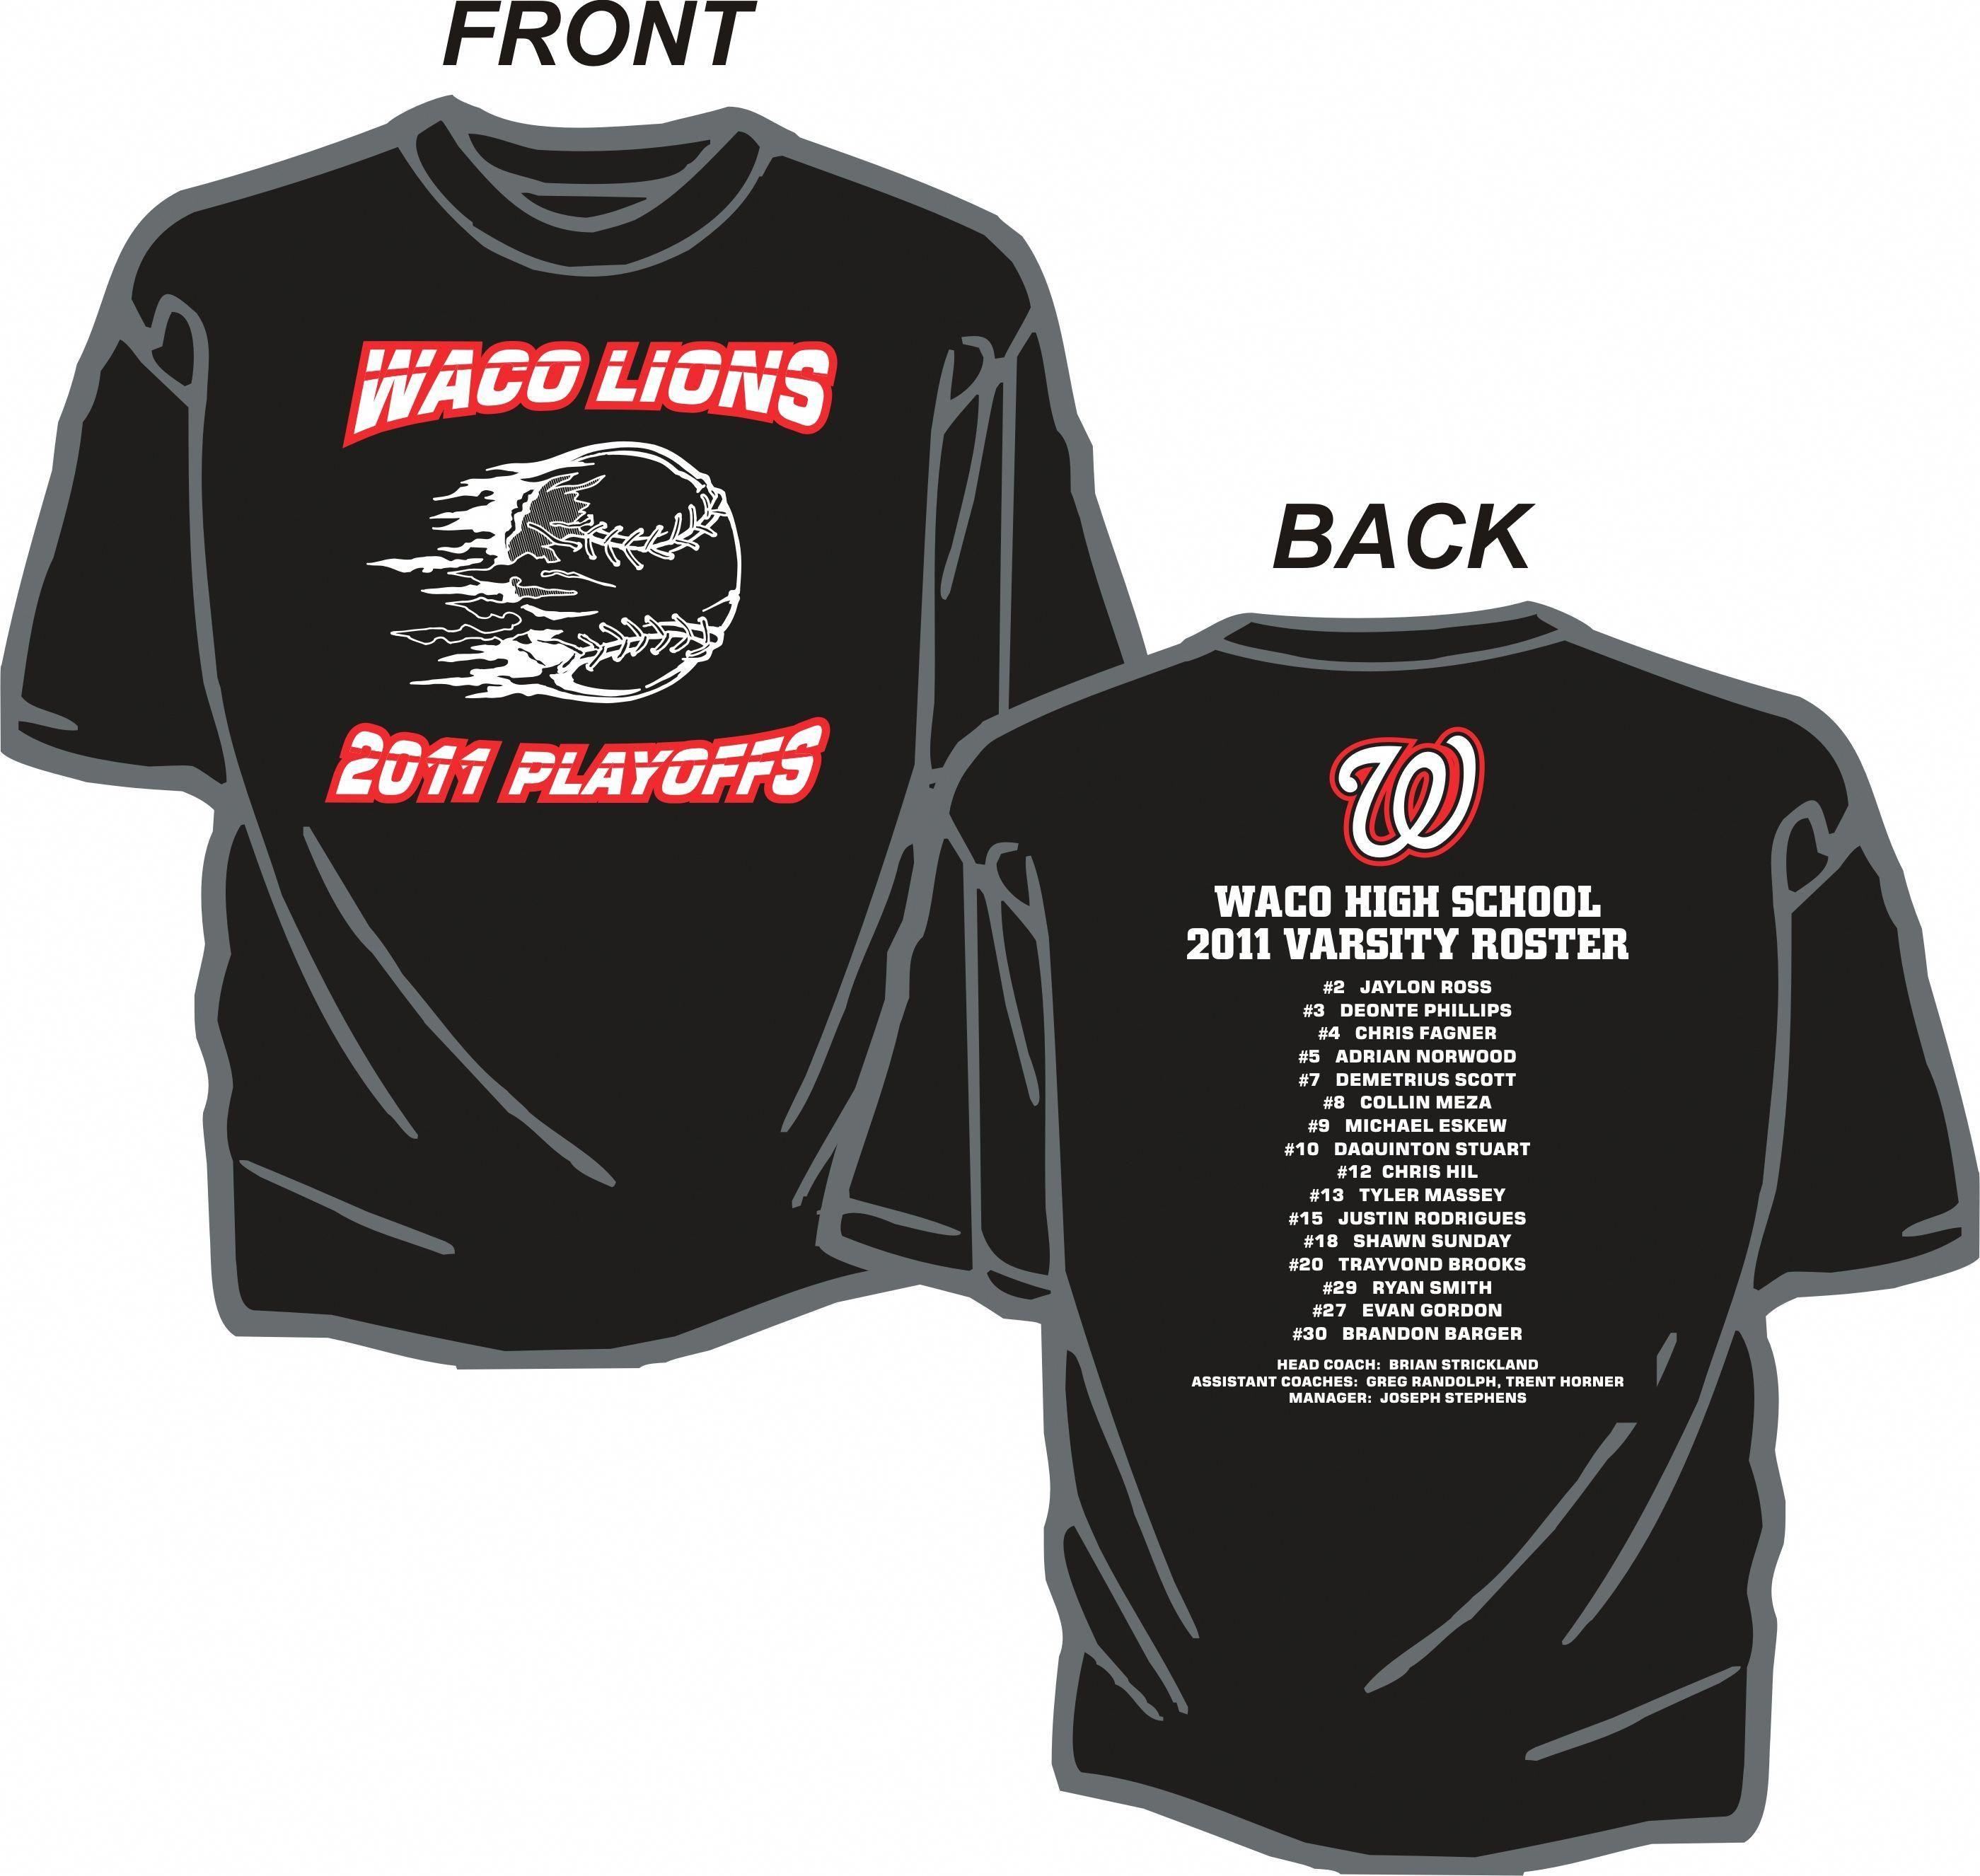 Baseball 5 Year Old Tennis Shirts Designs Tennis Shirts High School Football Playoffs